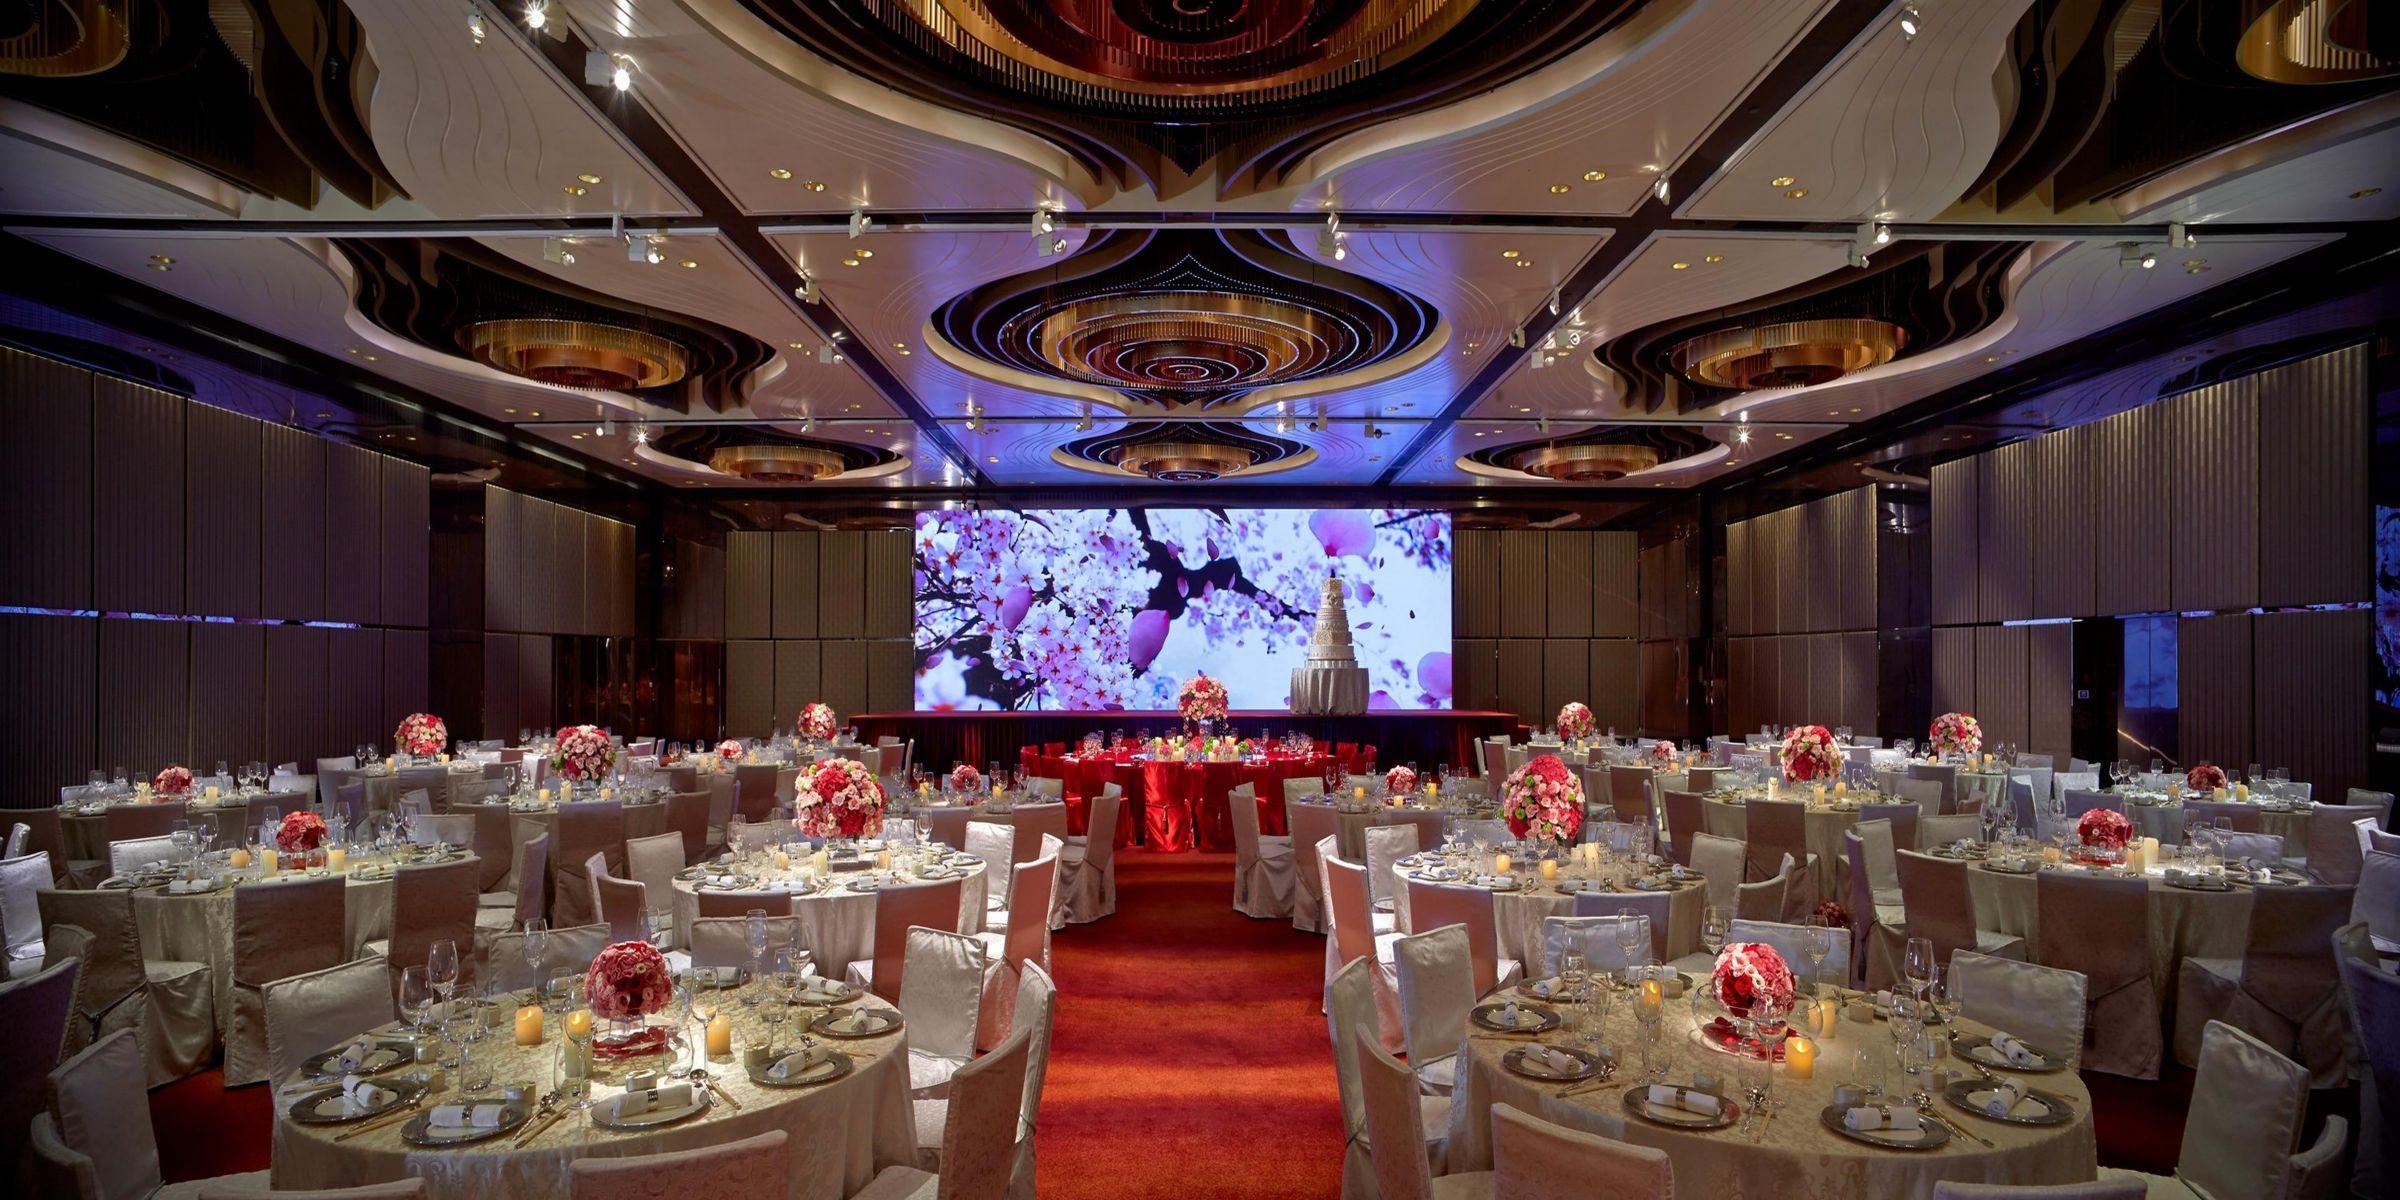 Intercontinental hong kong hotel meeting rooms wedding rentals ballroom classroom setting ballroom chinese wedding banquet setting ballroom staircase ballroom junglespirit Image collections